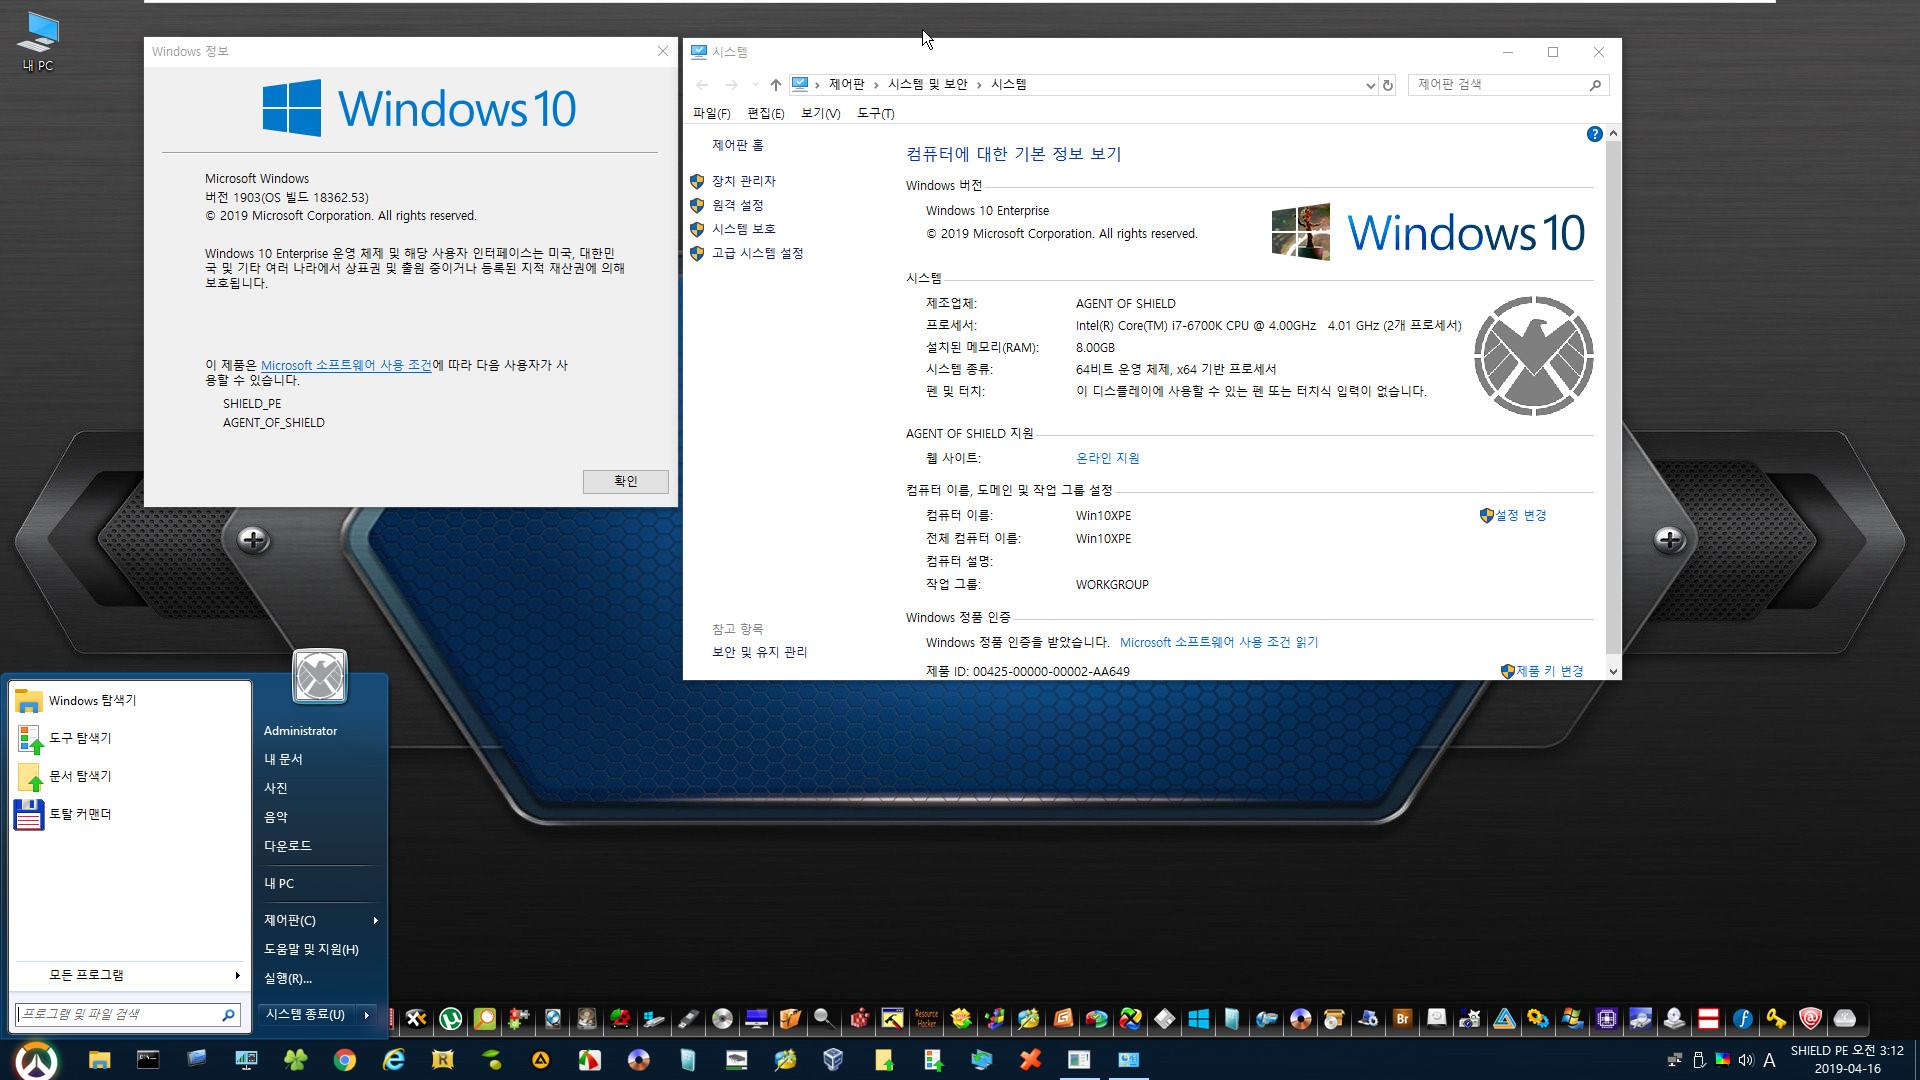 KJ_V5.0W10XPEx64_SHIELD19H1.ISO  를 VHD에 풀어서 vmware 구경하기 2019-04-16_031209.jpg